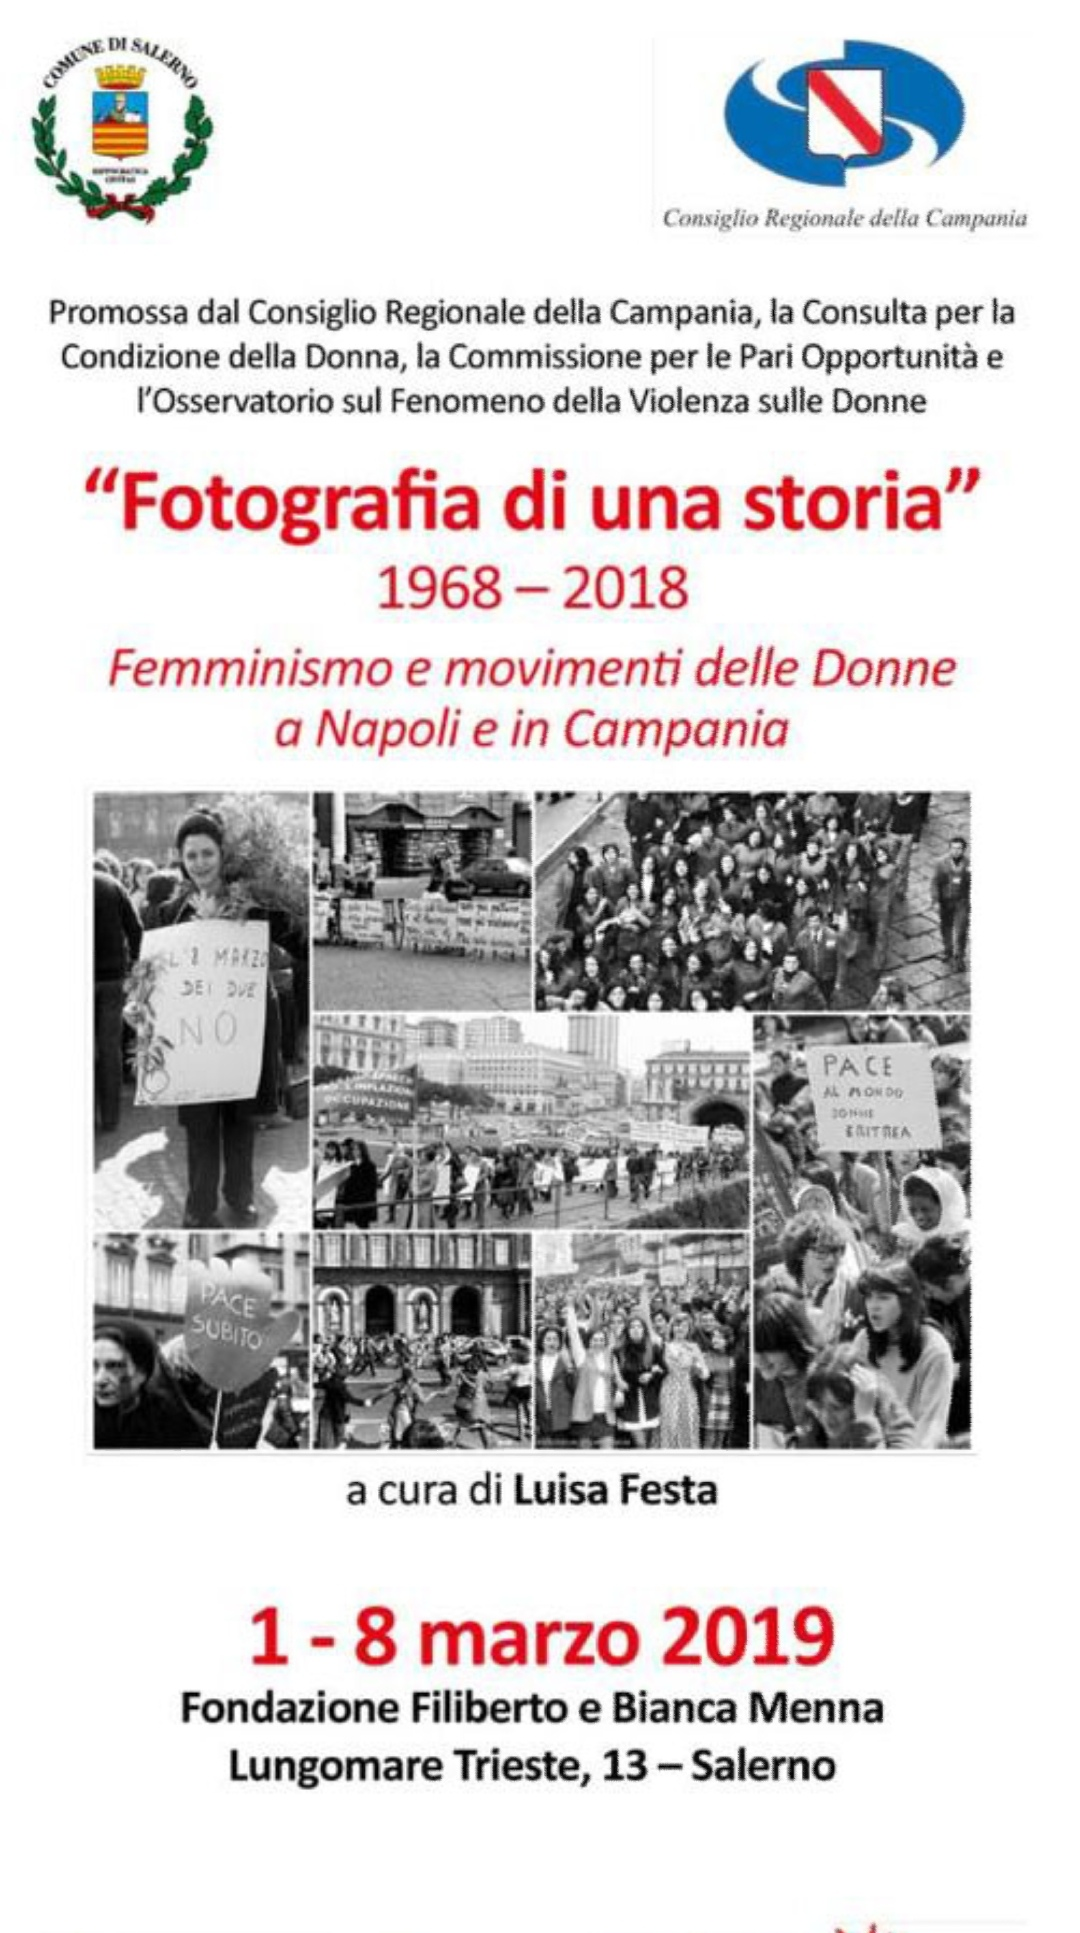 Fotografia di una storia-mostra fotografica-Salerno